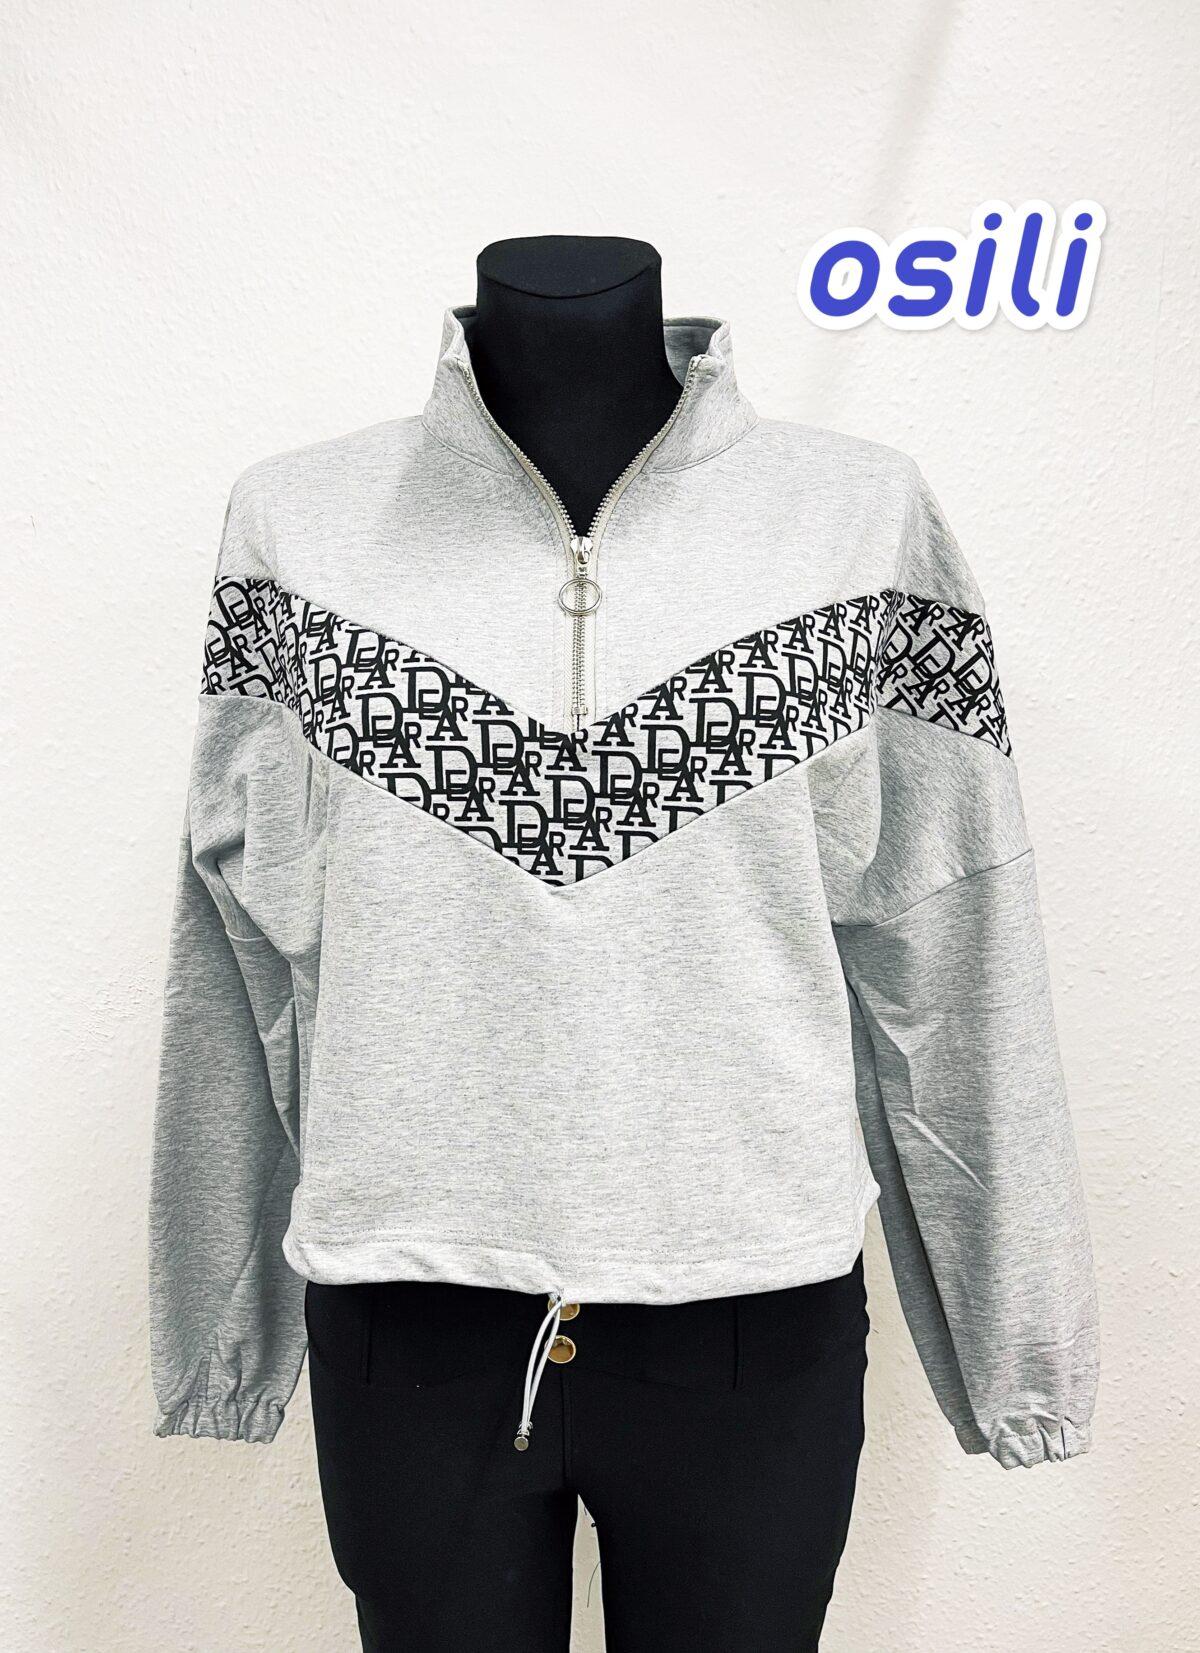 3B71142B E51E 4B36 A63B DF93C571B4B5 scaled Osili - Fashion - Divat